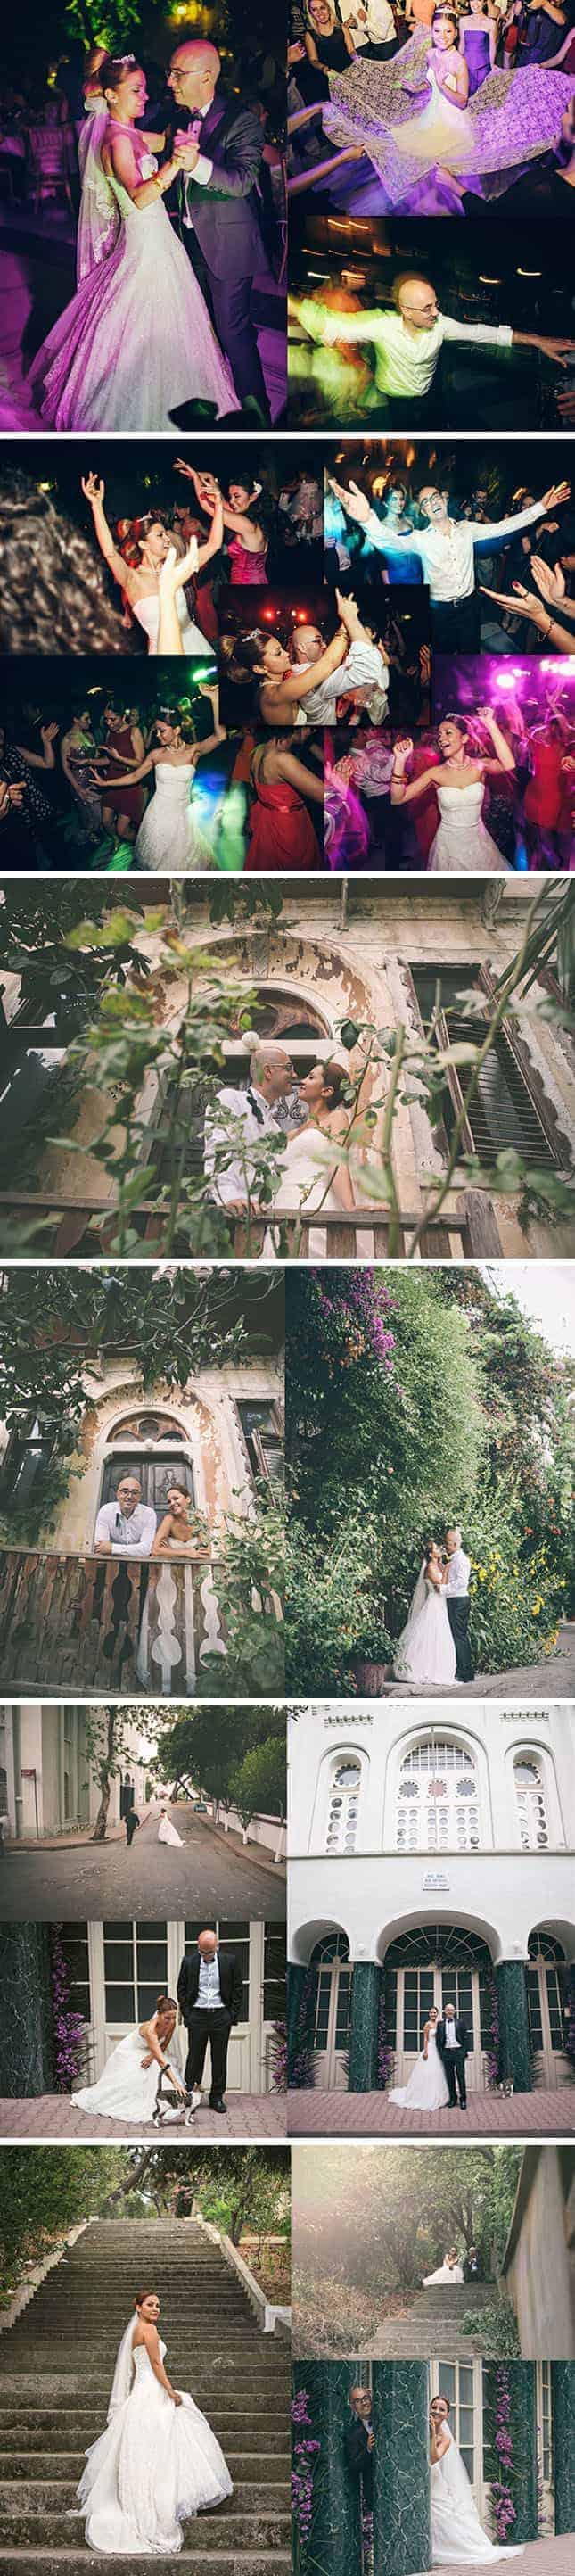 thras_the_dress_fotograflari_007 copy